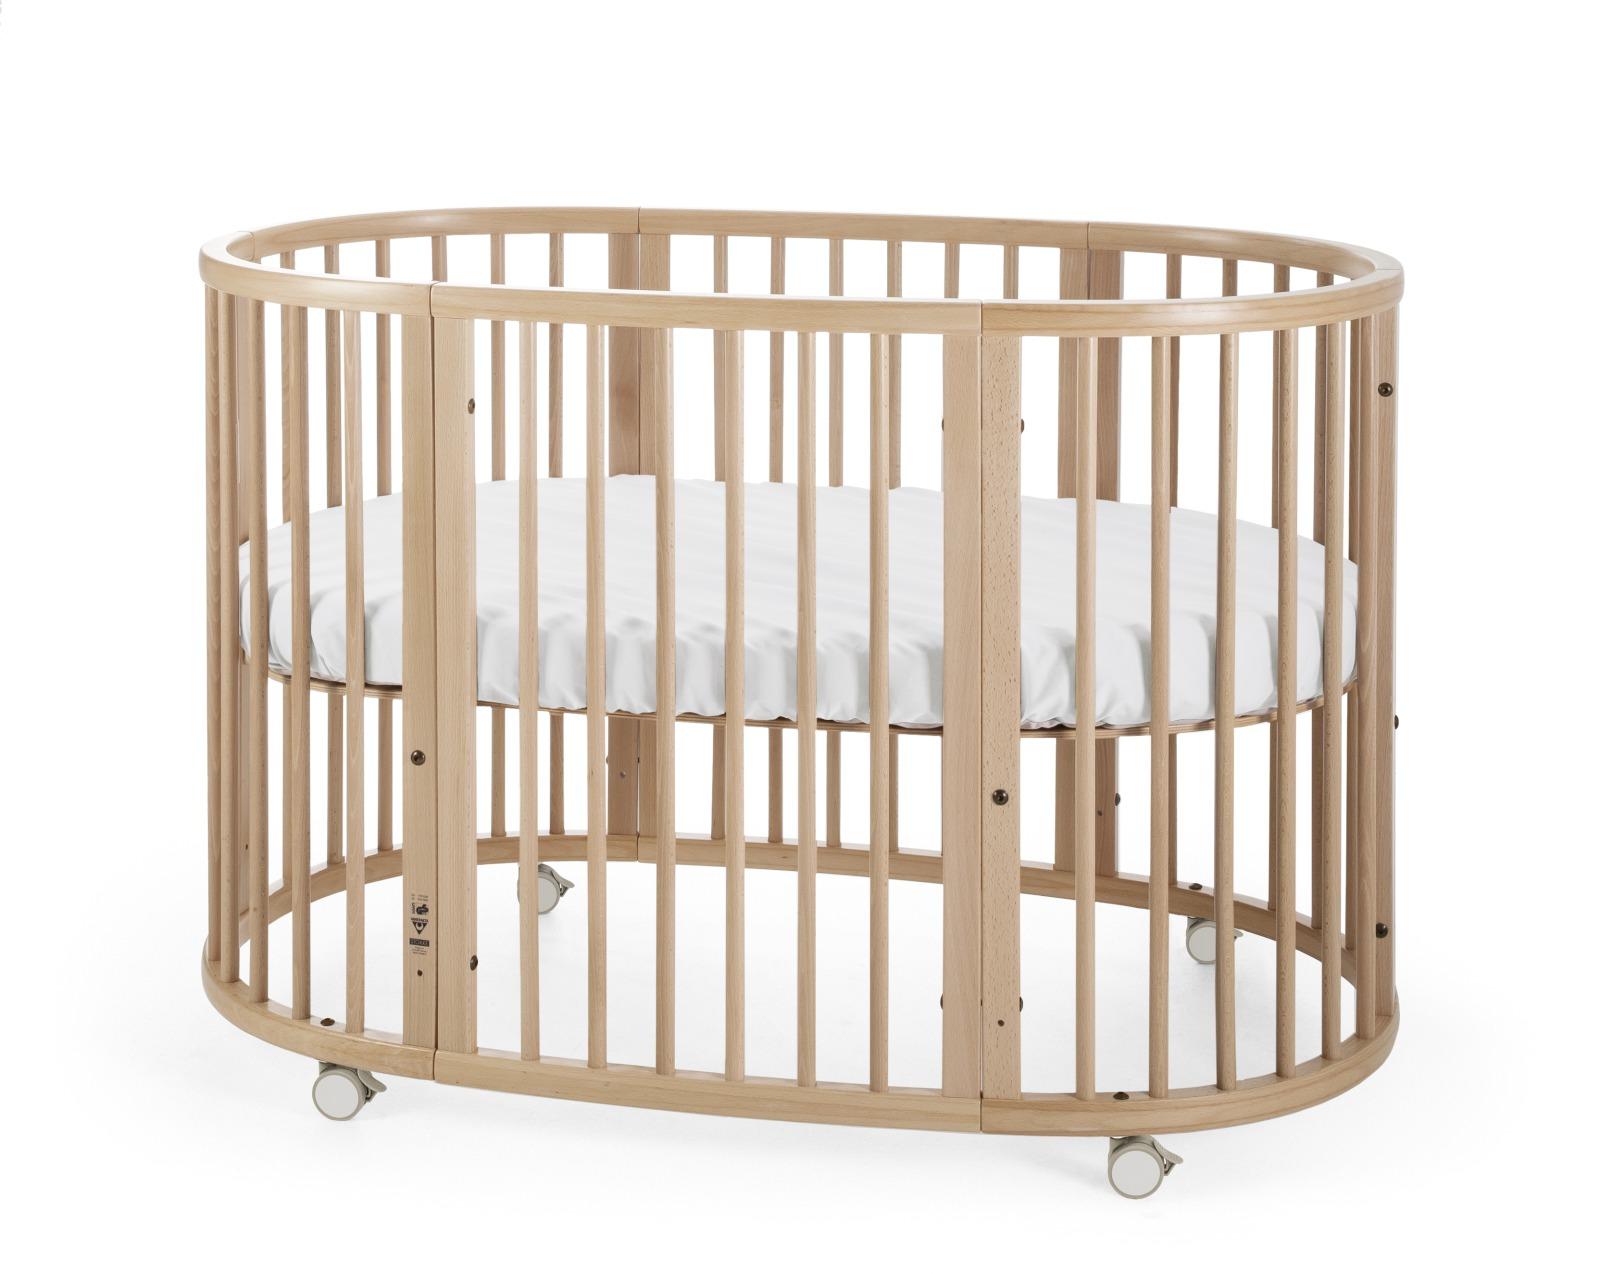 A Stokke/® Sleepi Bett Kit-Verl/ängerung Kinderbett